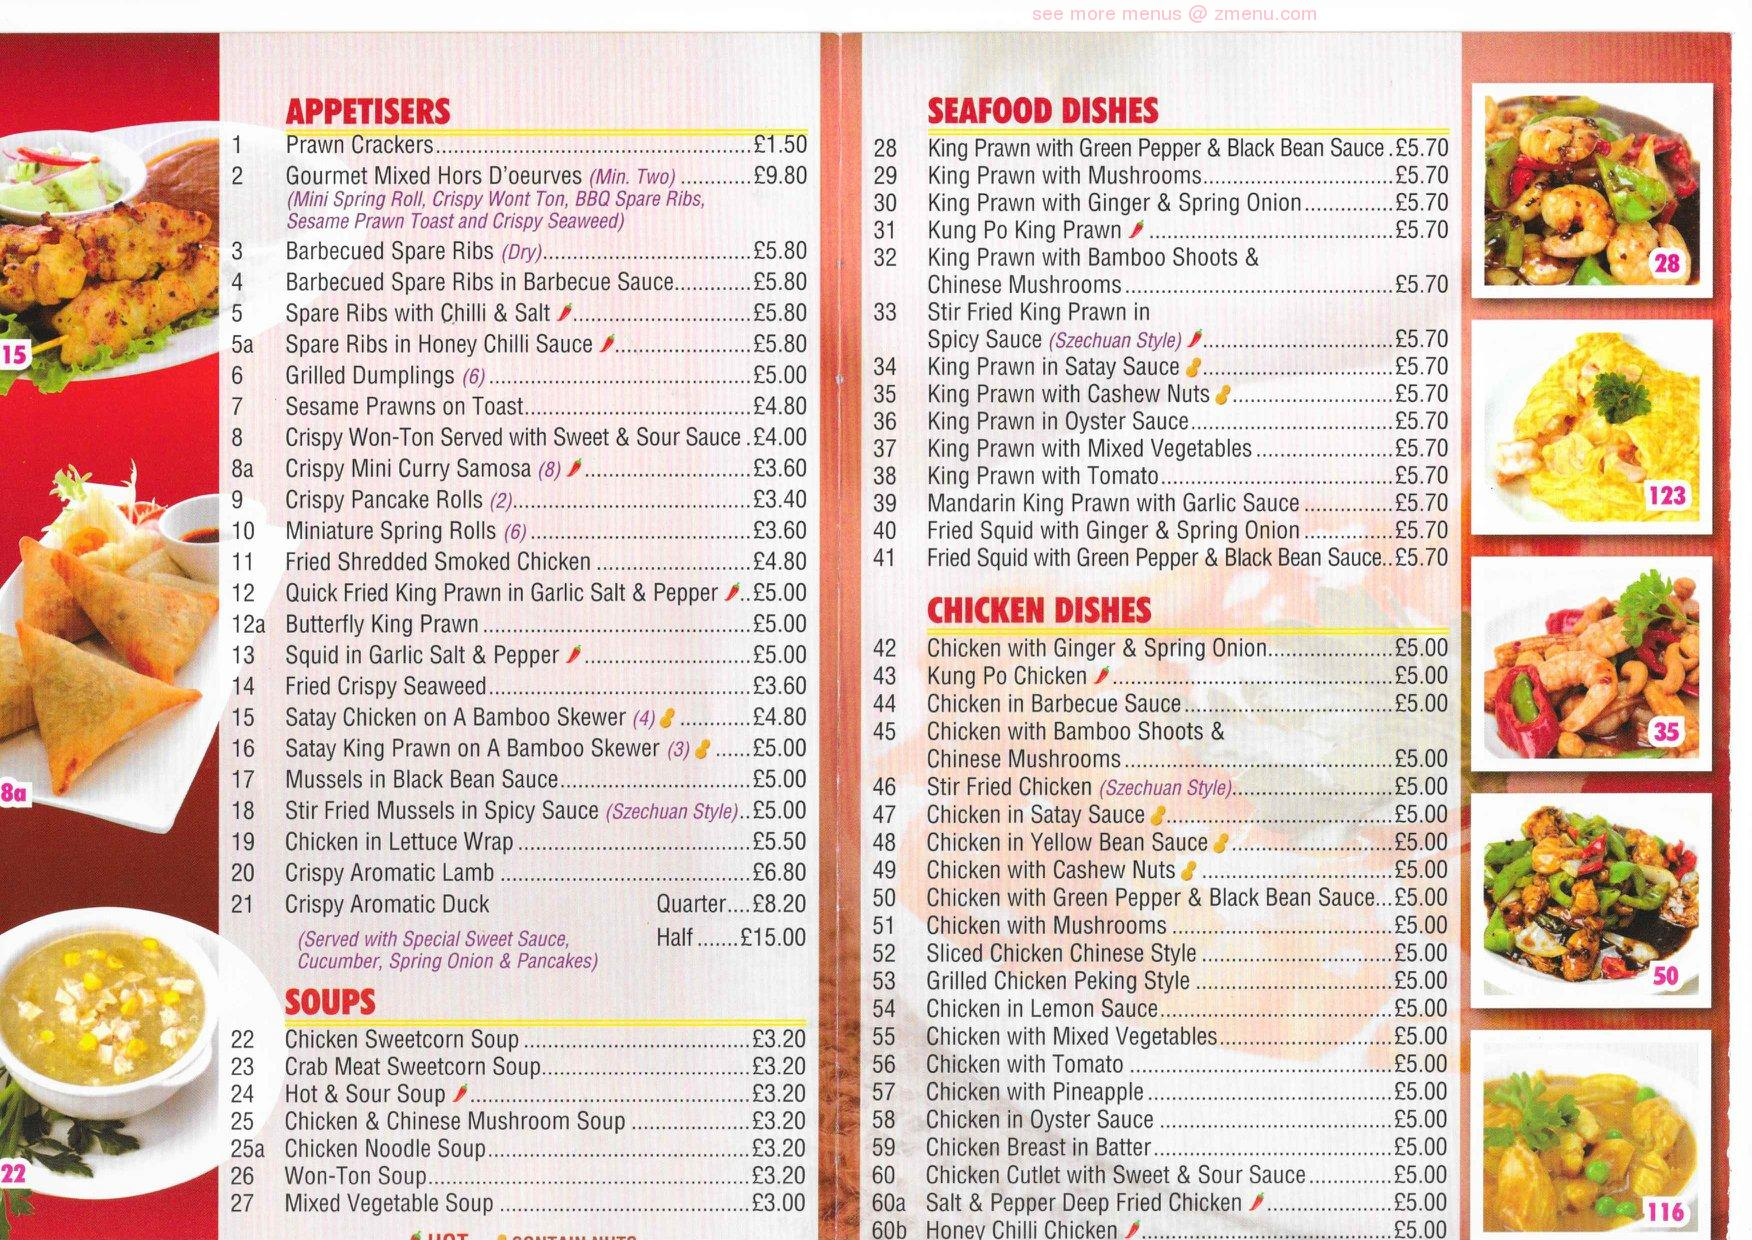 Online Menu Of China Palace Restaurant Prescot United Kingdom L34 5sb Zmenu